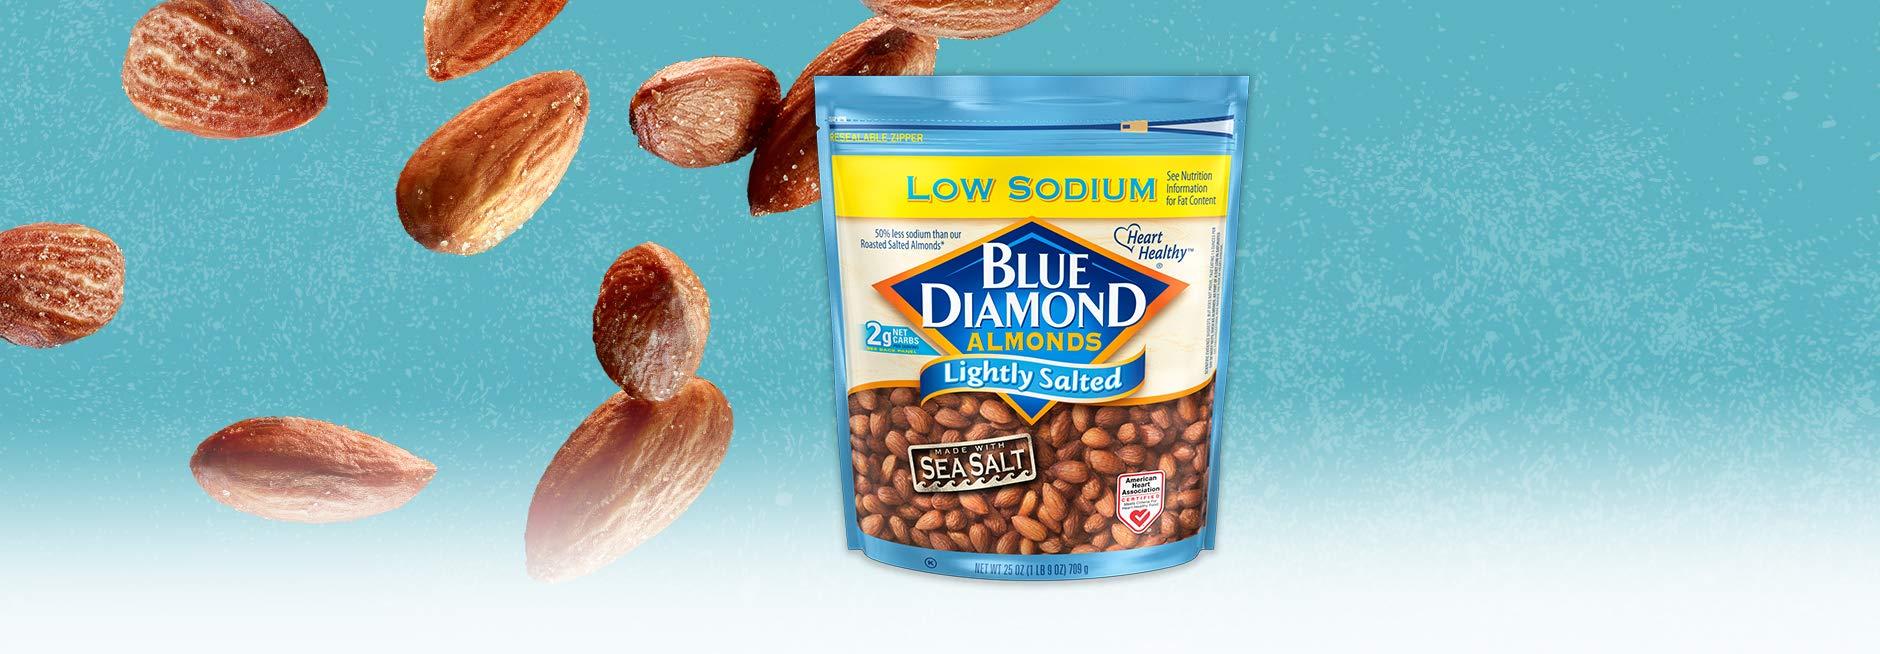 Blue Diamond Almonds, Low Sodium Lightly Salted, 25 Ounce by Blue Diamond Almonds (Image #3)